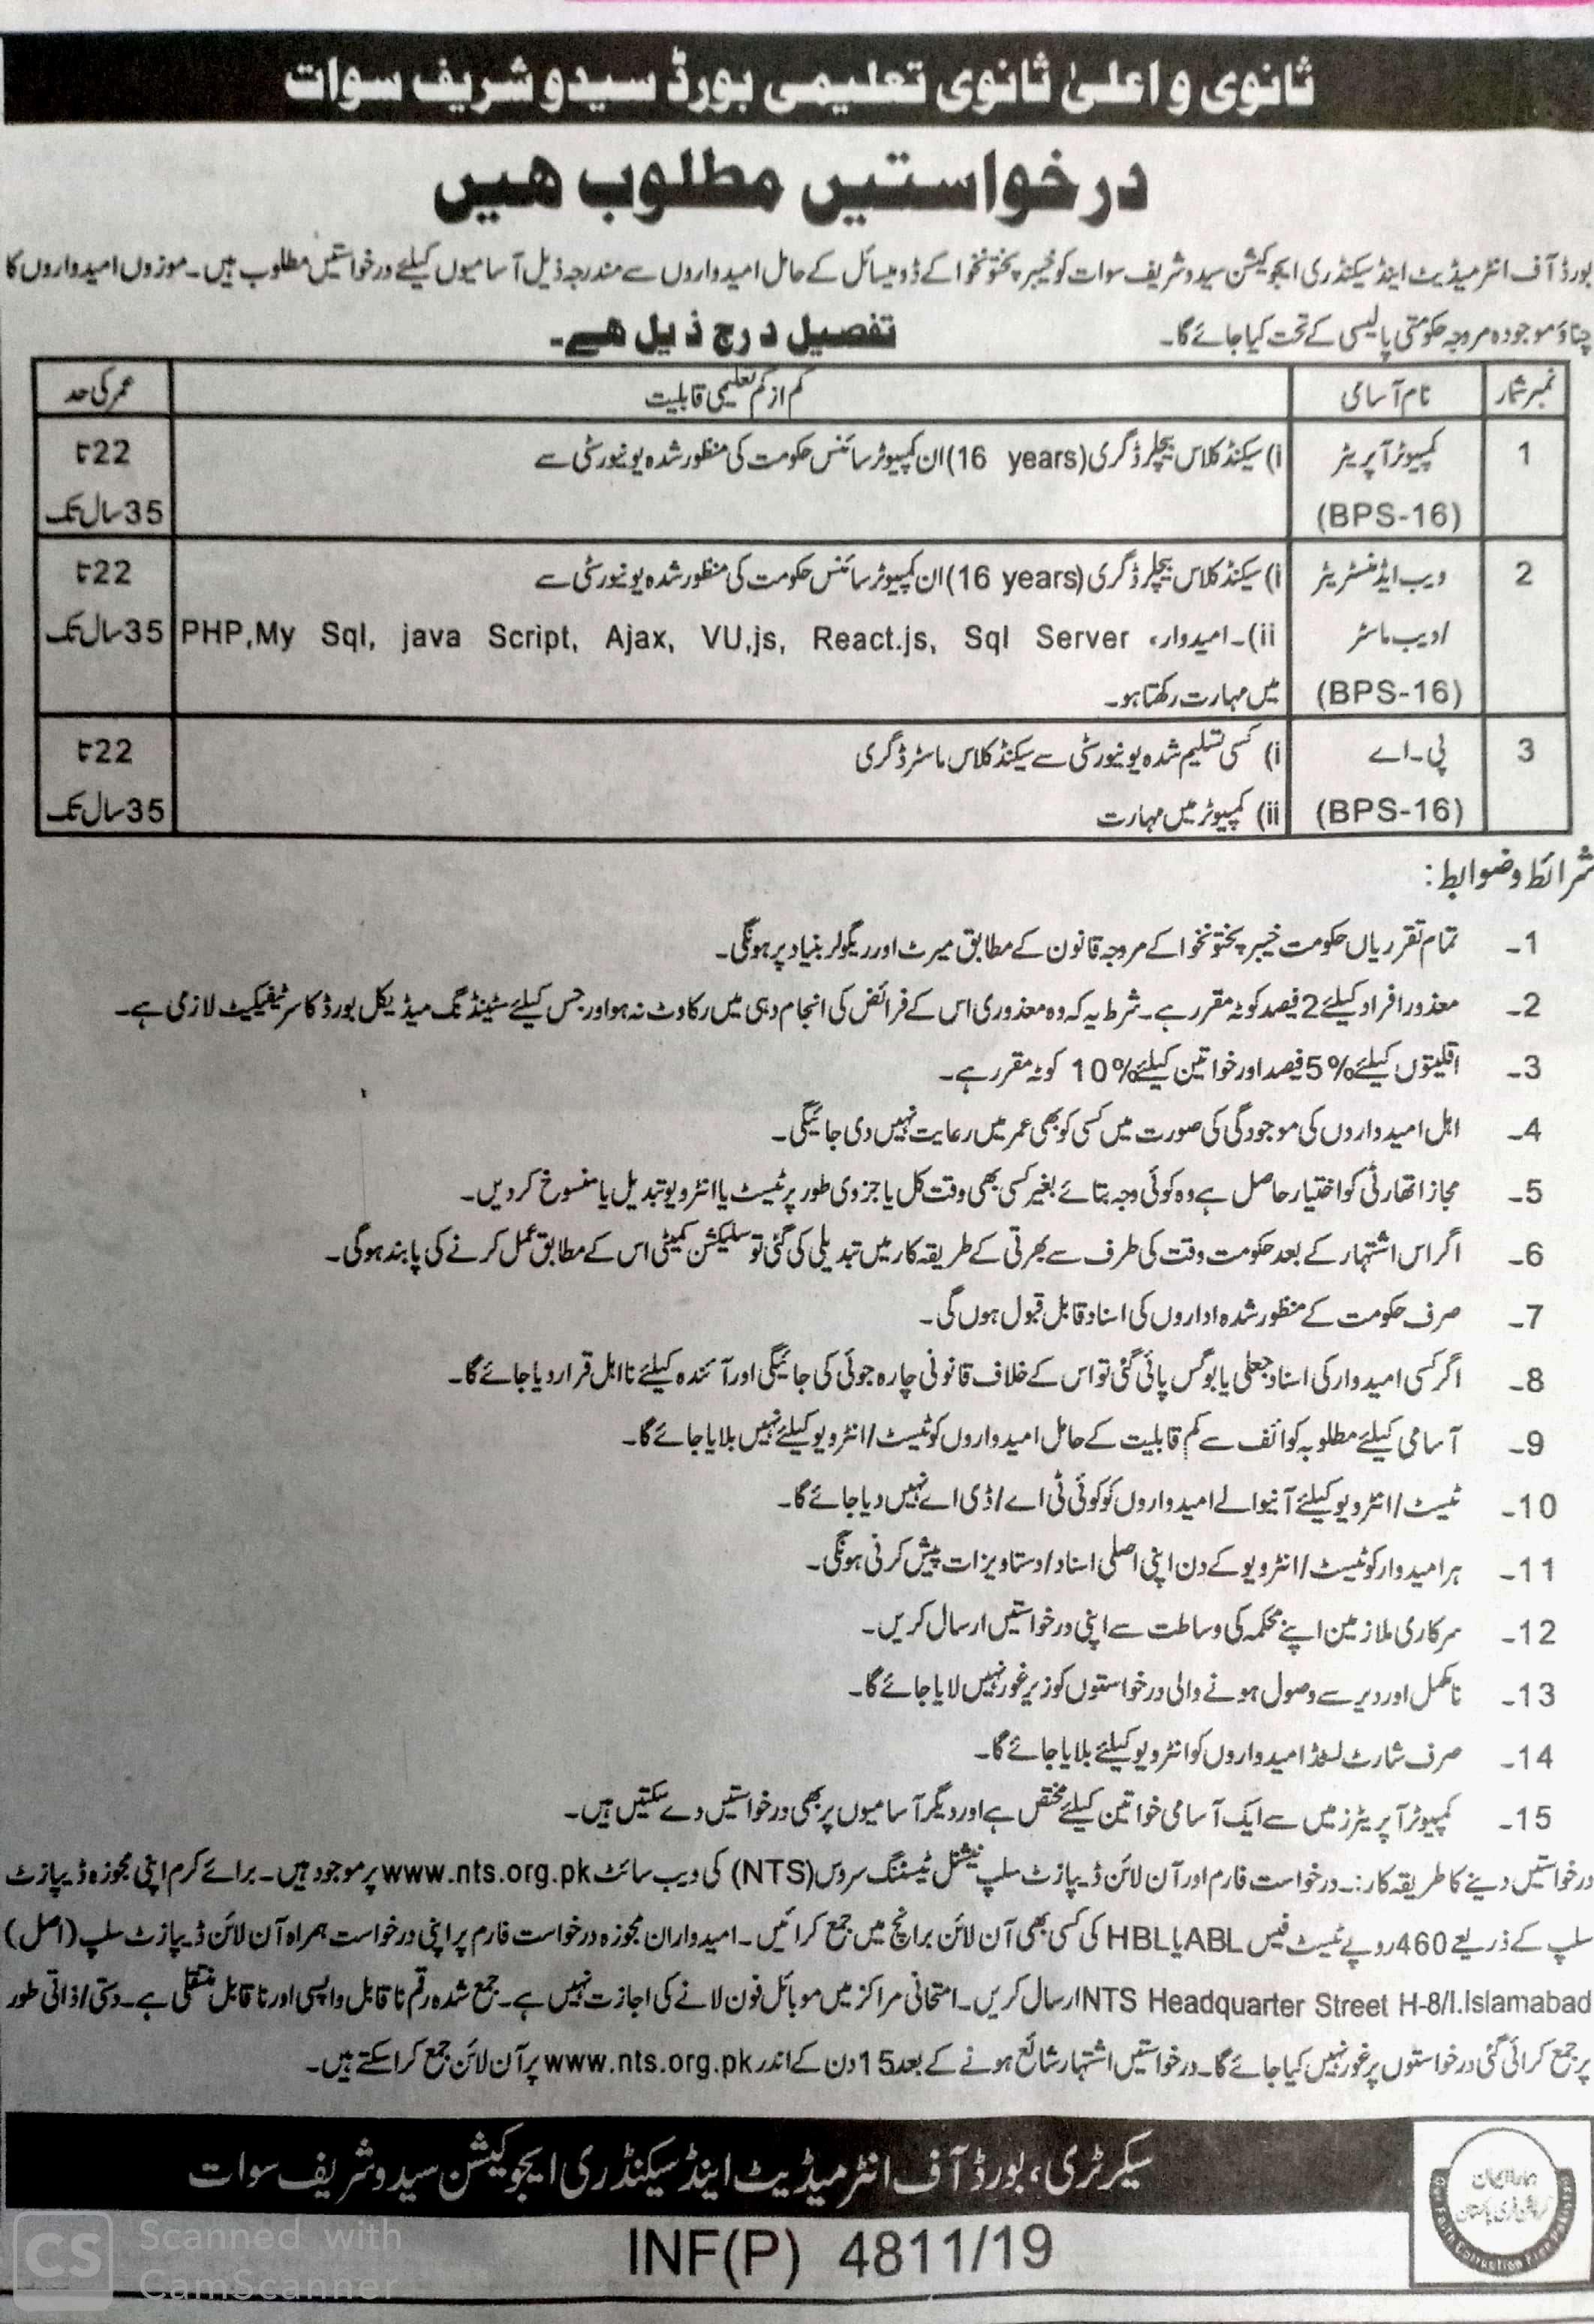 BISE Saidu Sharif Swat NTS Jobs 2019 Application Form Roll No slip